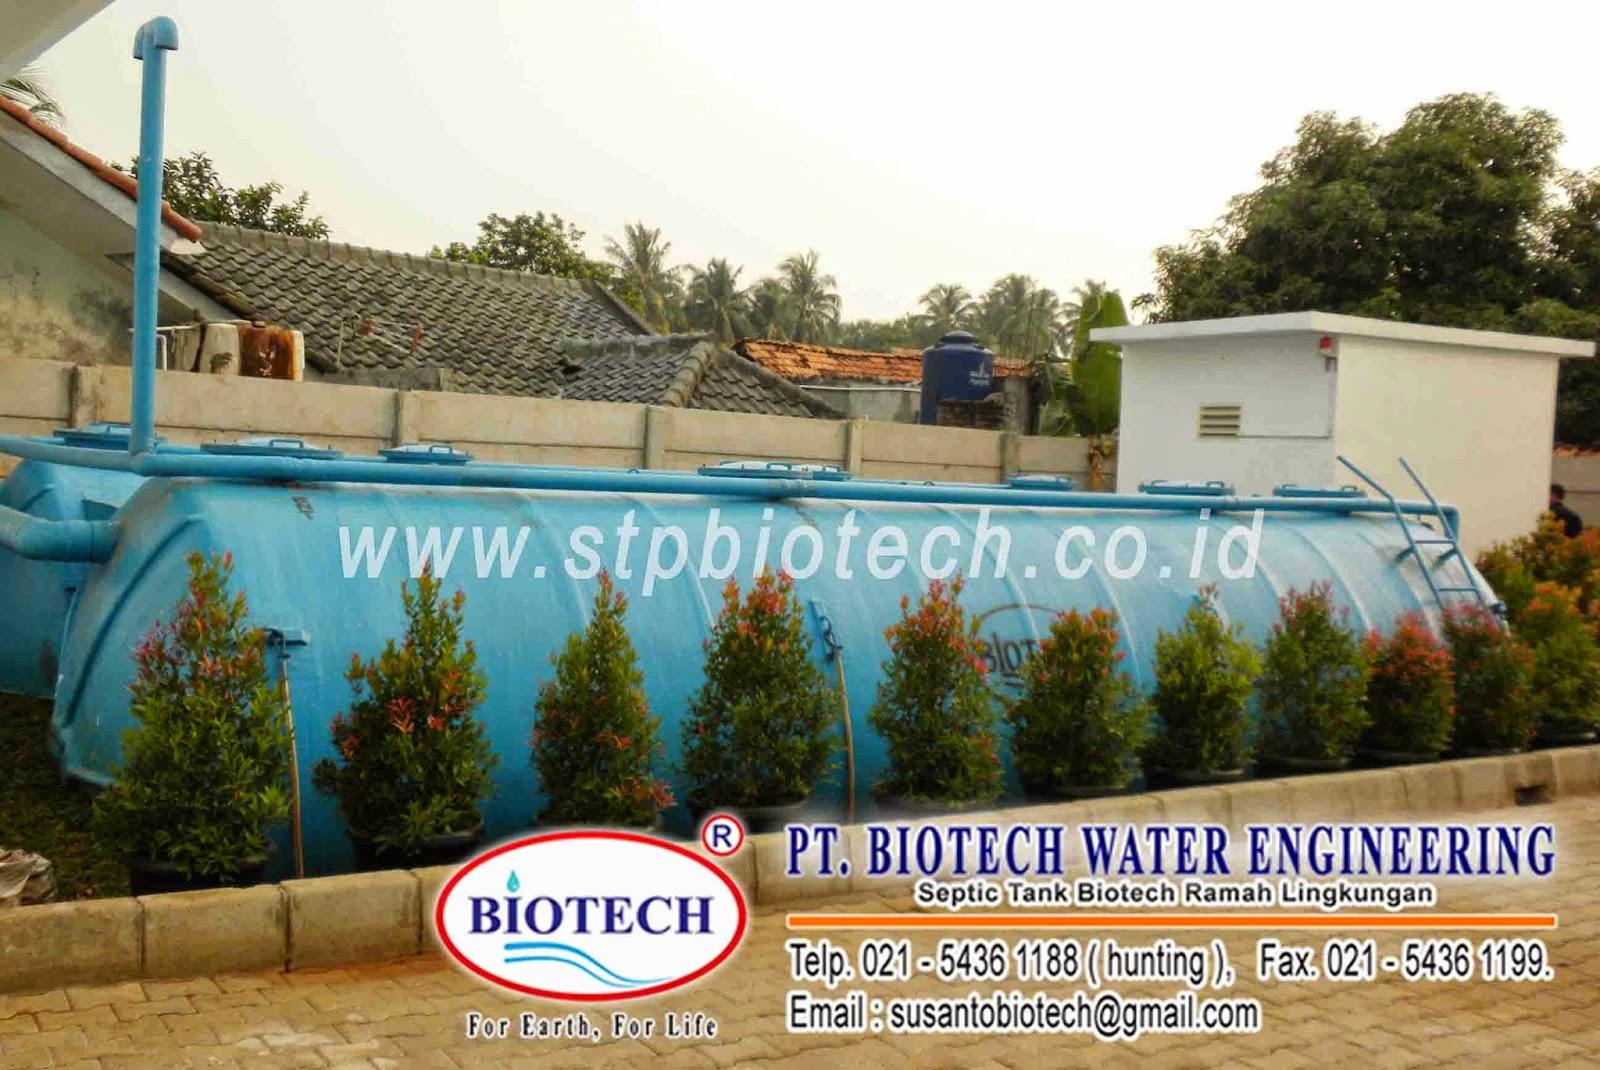 stp biotech, ipal biotech, septictank biotech, biofil, biotank, biosafe